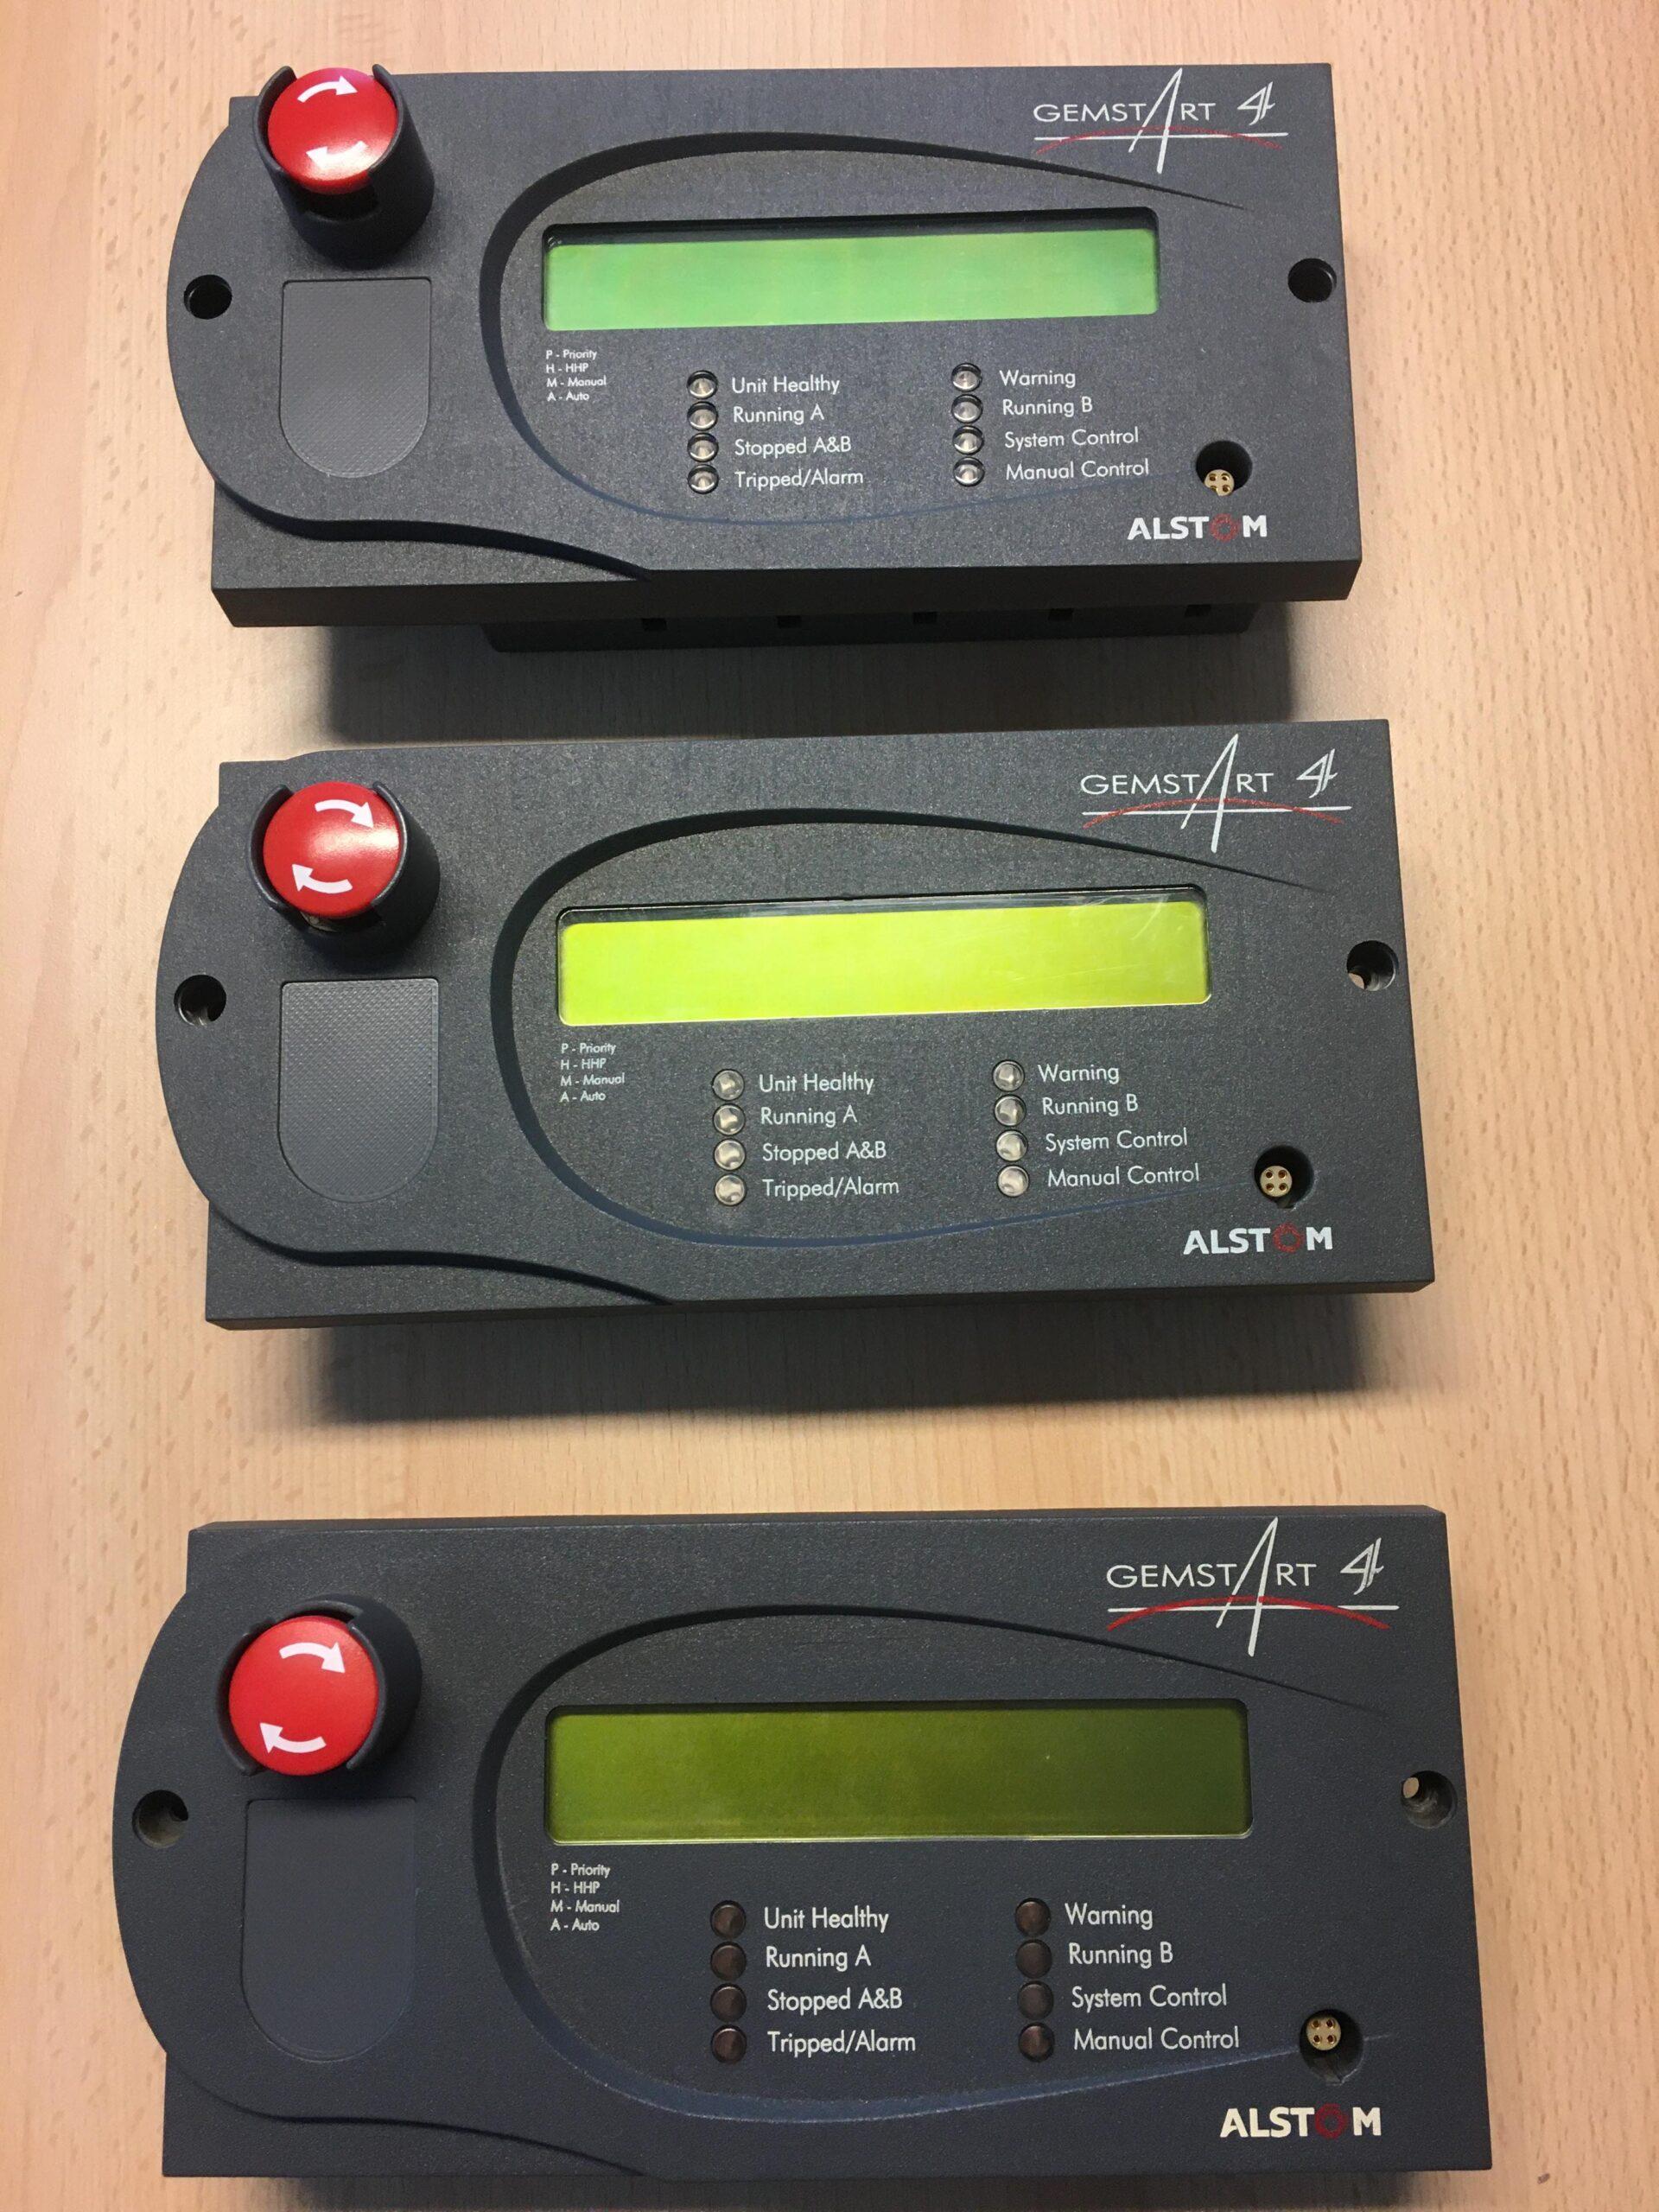 ALSTOM Gemstart 4 controller